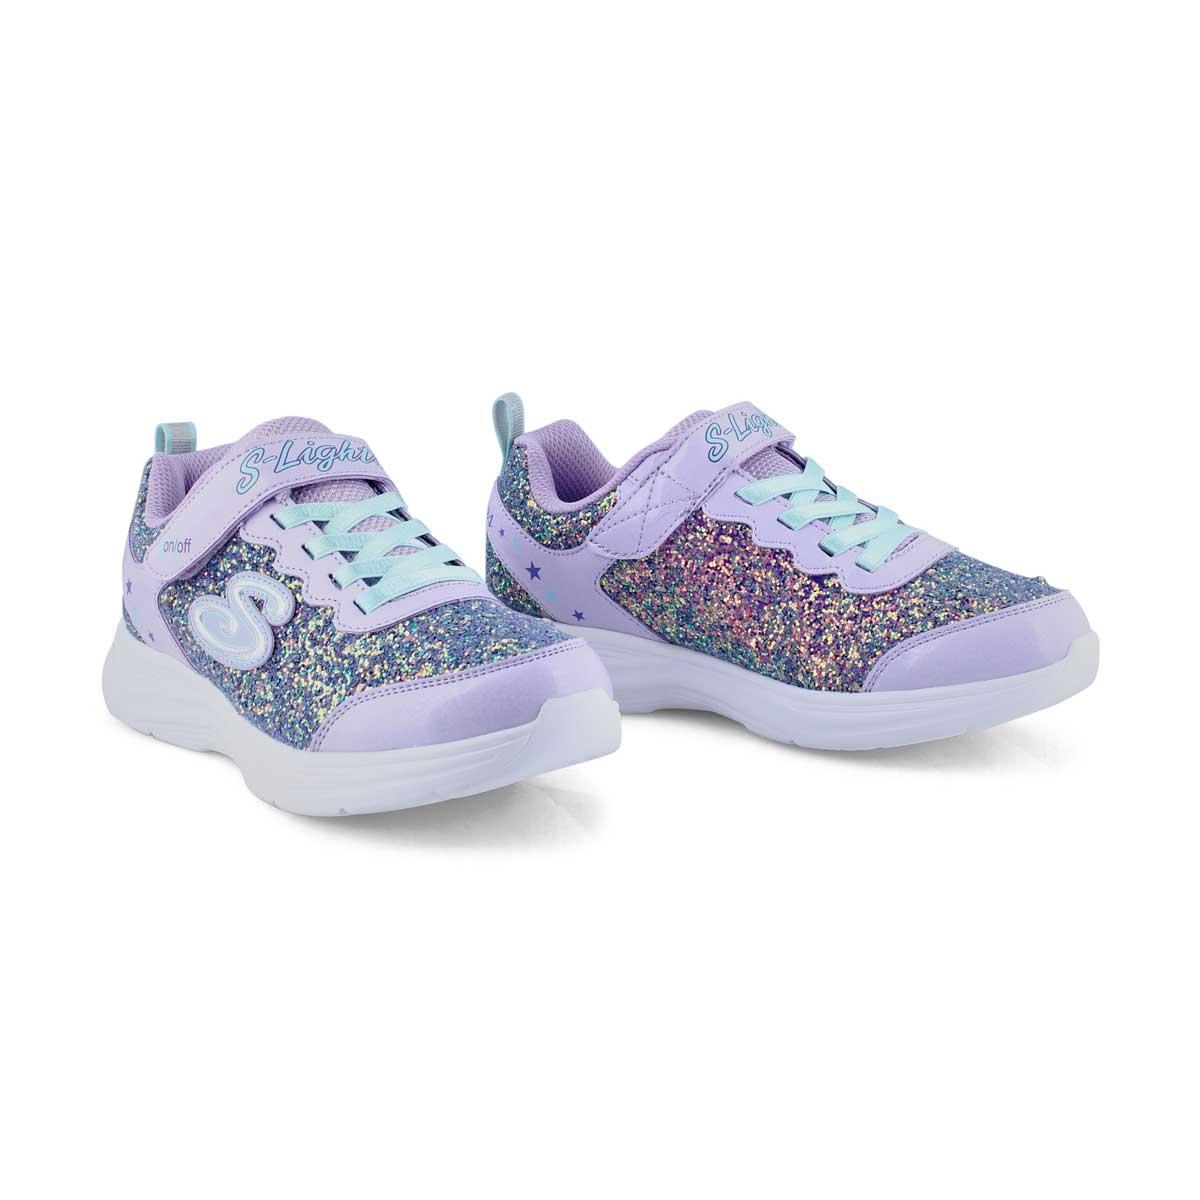 Infs-g Glimmer Kicks lvndr sneaker